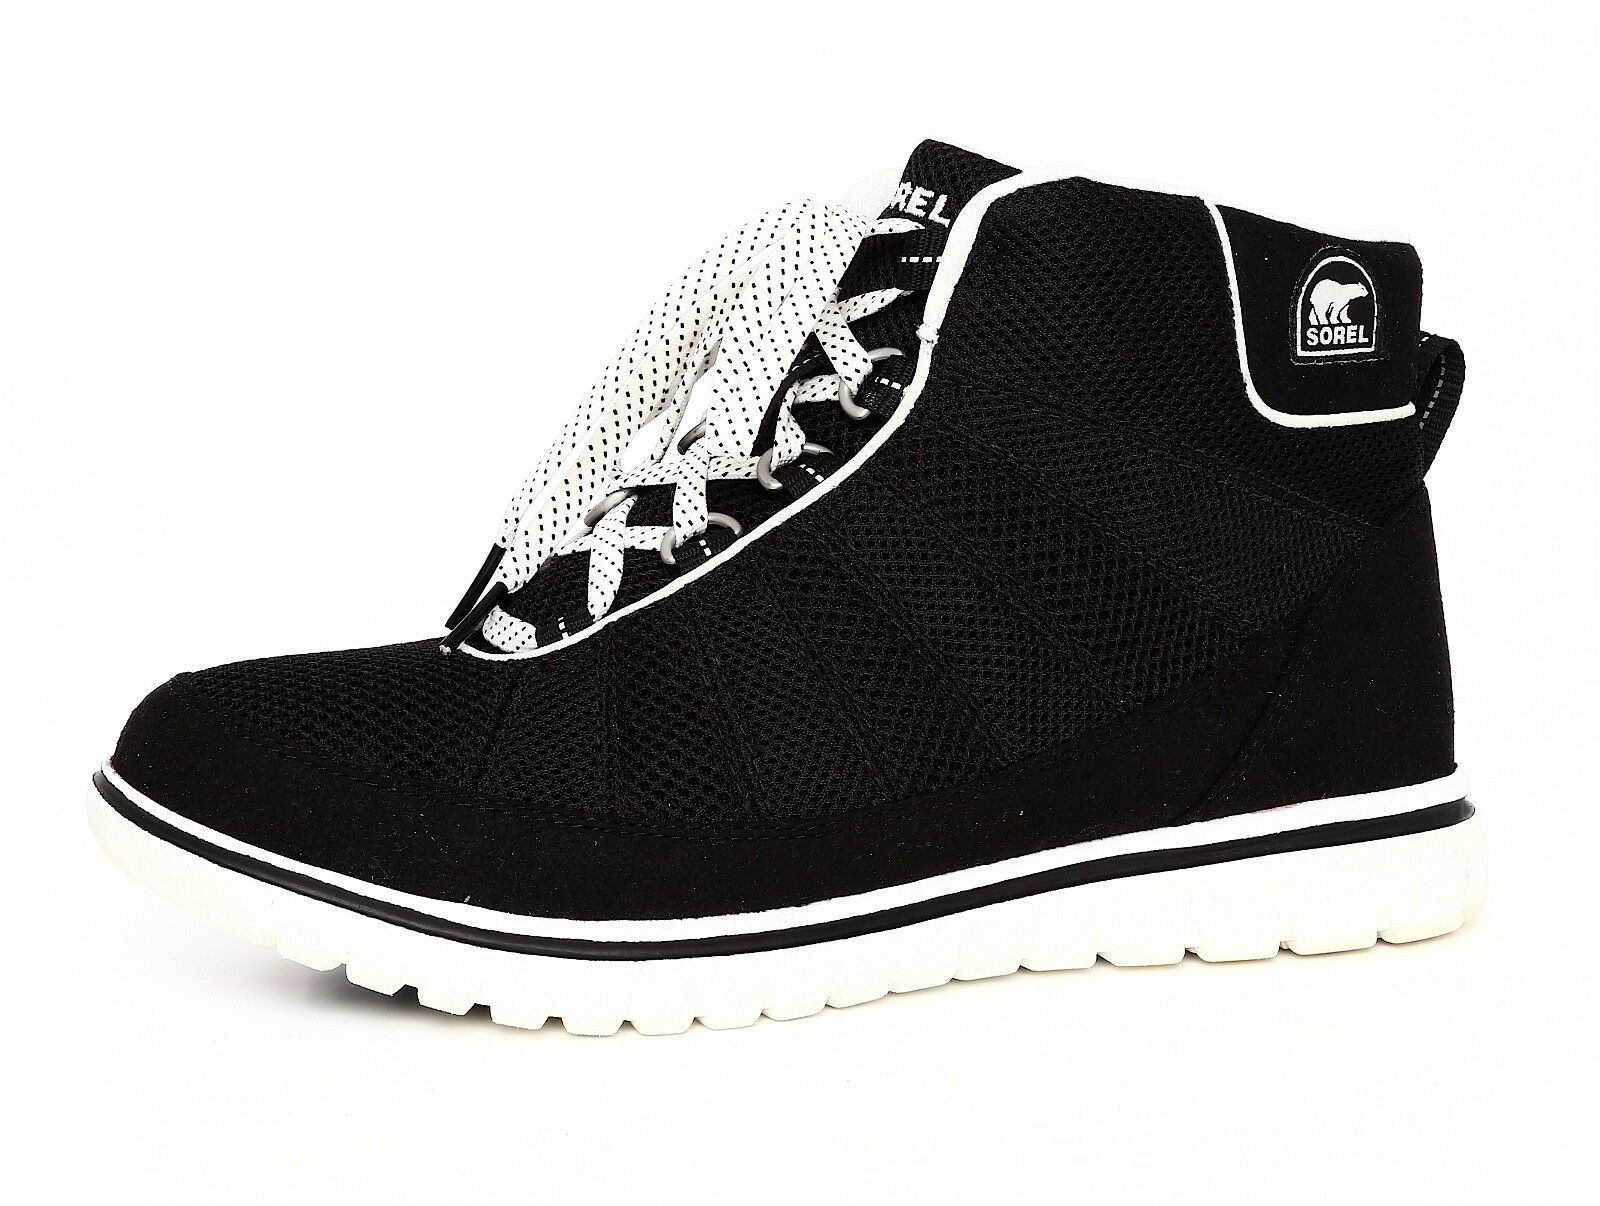 Sorel Tivoli Women's Black Go High Sneaker Sz 9.5 3436*